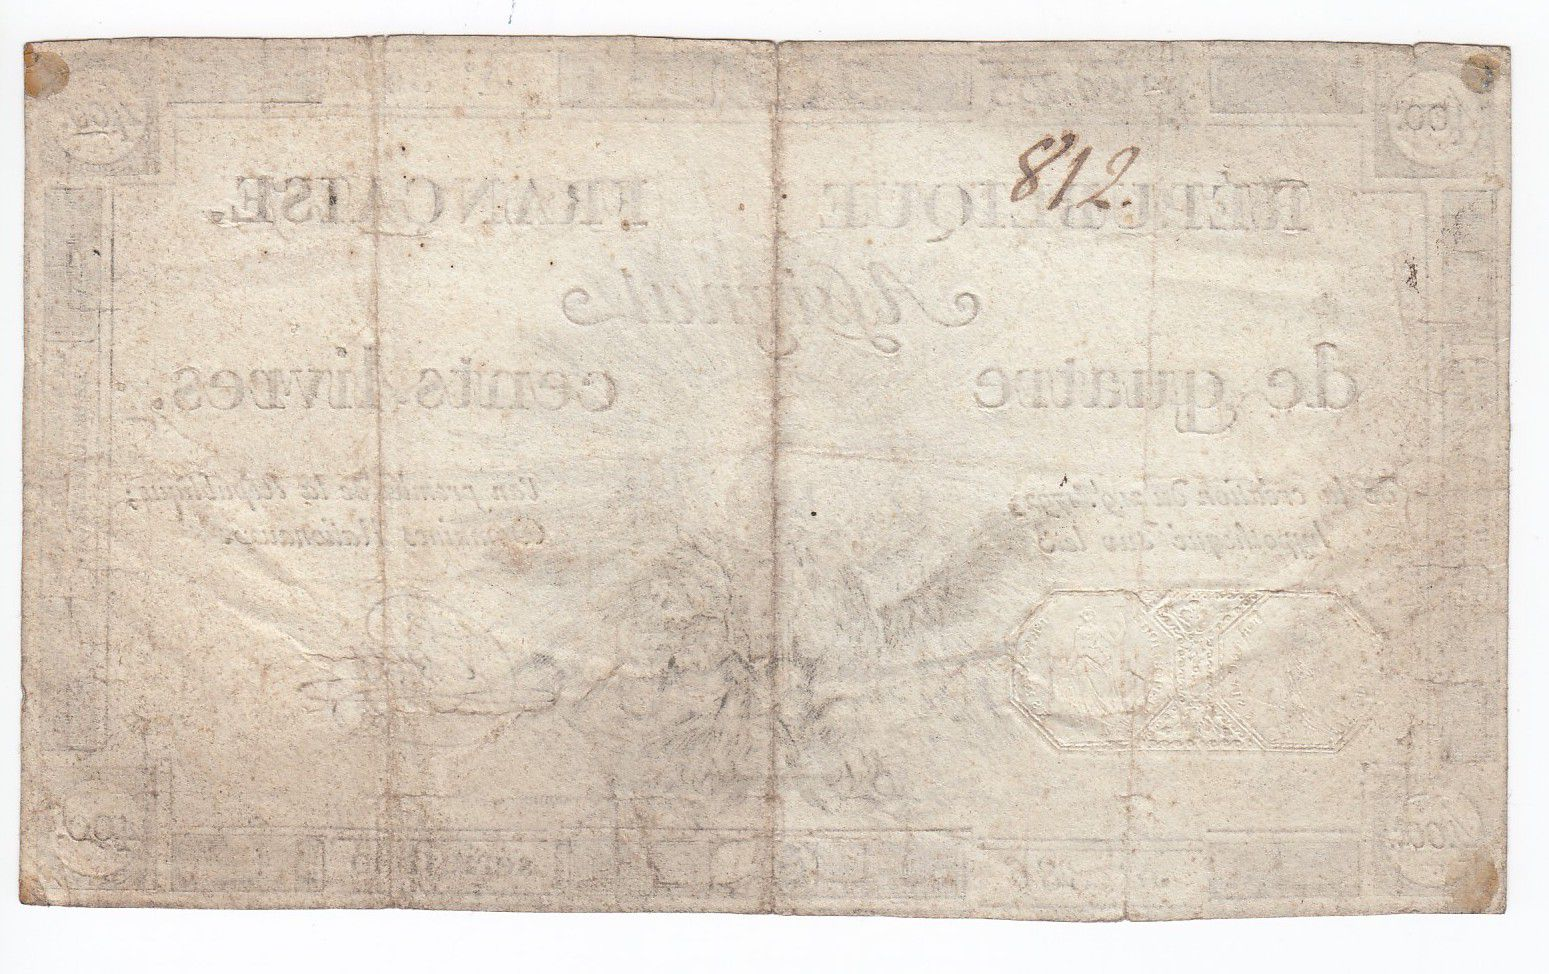 France 400 Livres 21-11-1792 - Sign. Evin Série 1853 - TTB